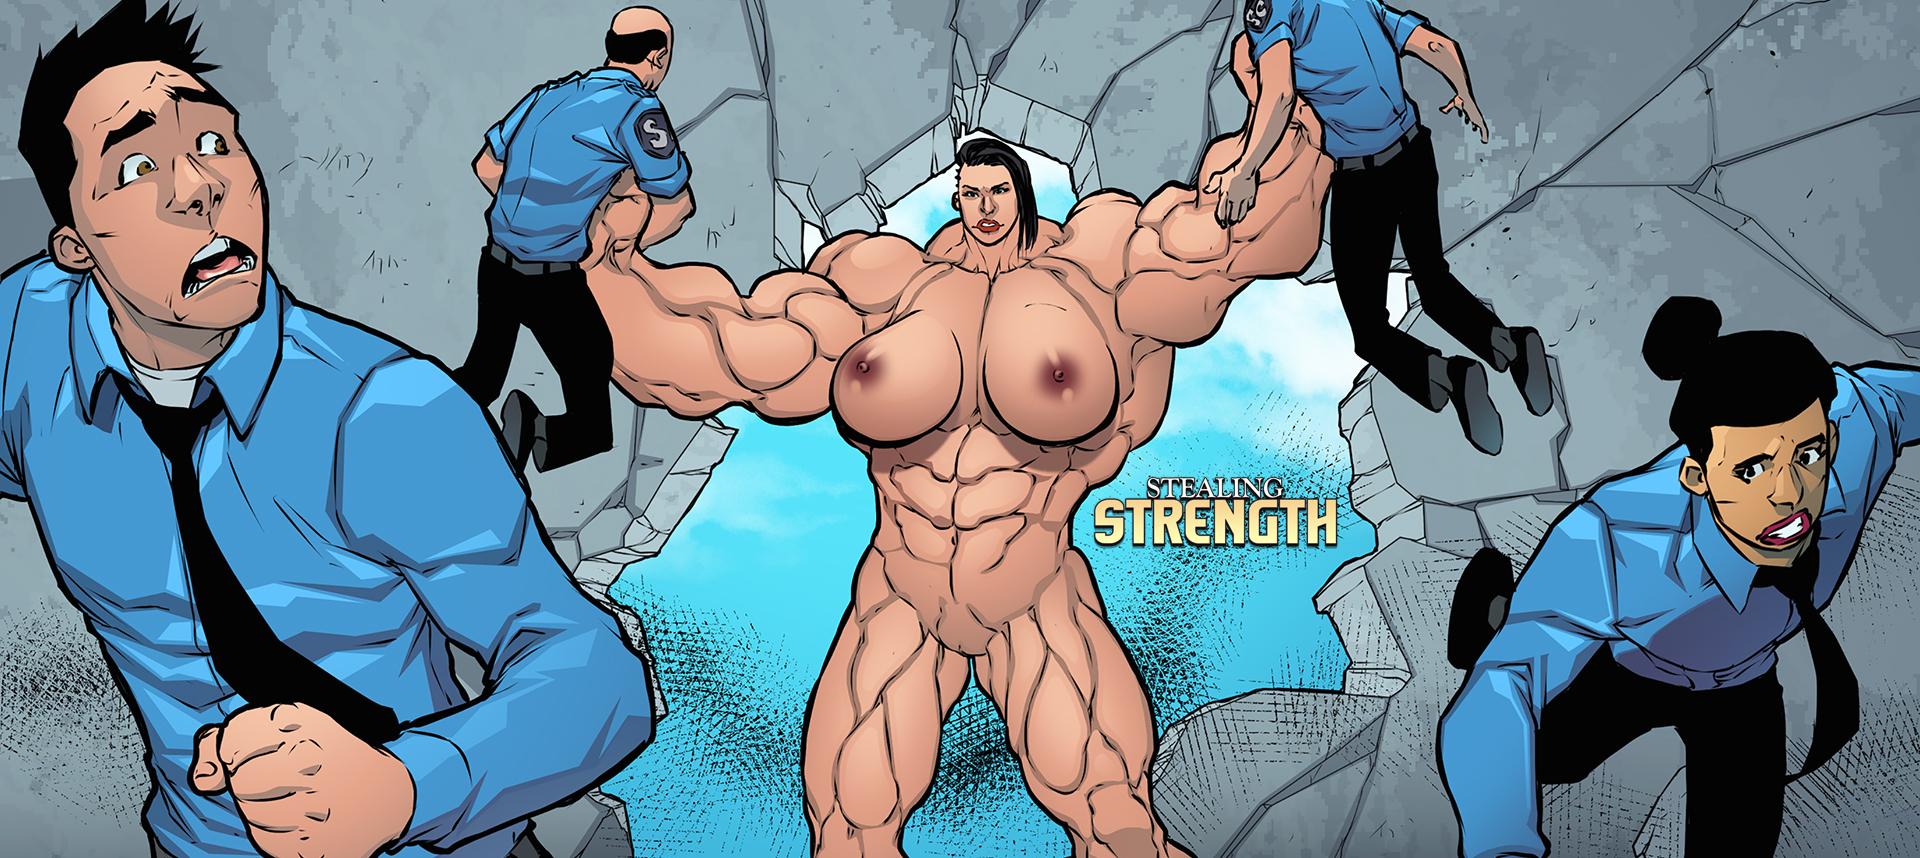 Stealing-Strength_02-SLIDEe